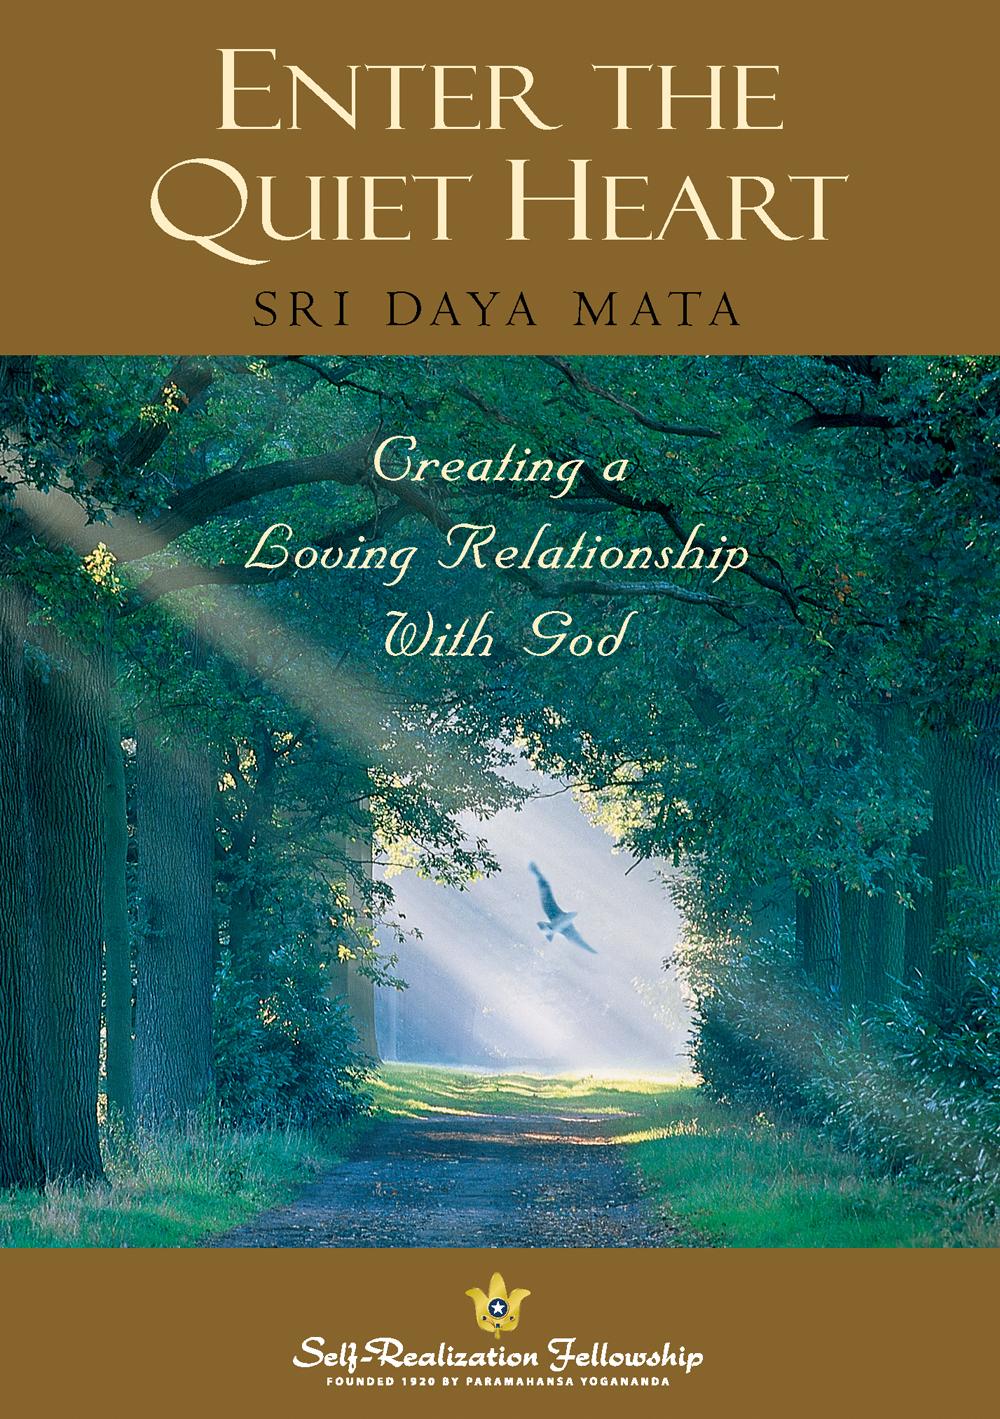 Enter the Quiet Heart, Self-Realization Fellowship, Sri Daya Mata